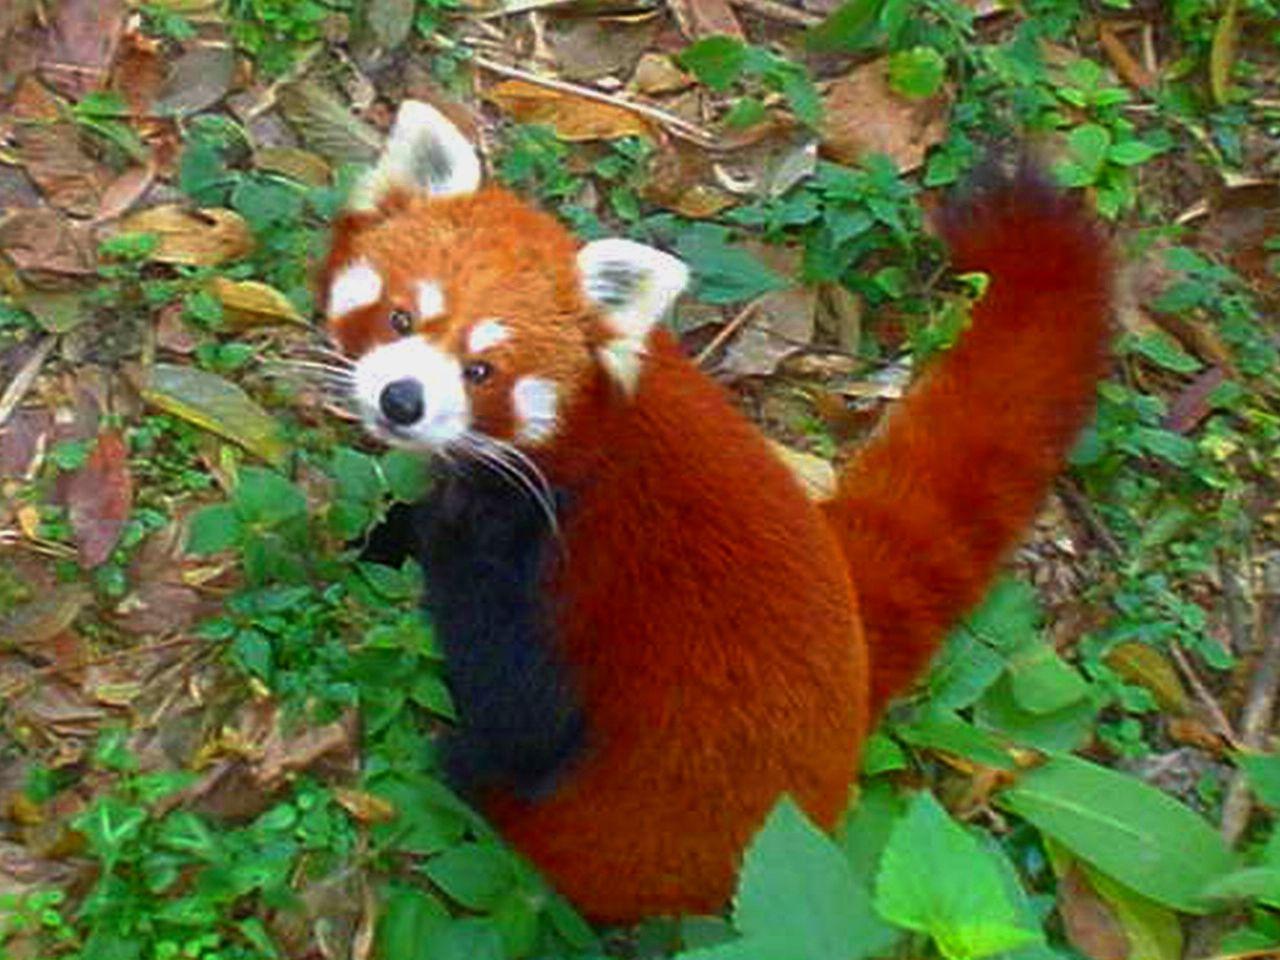 Image by Racquel Gilbert on Zoo Himalayan Wild animals